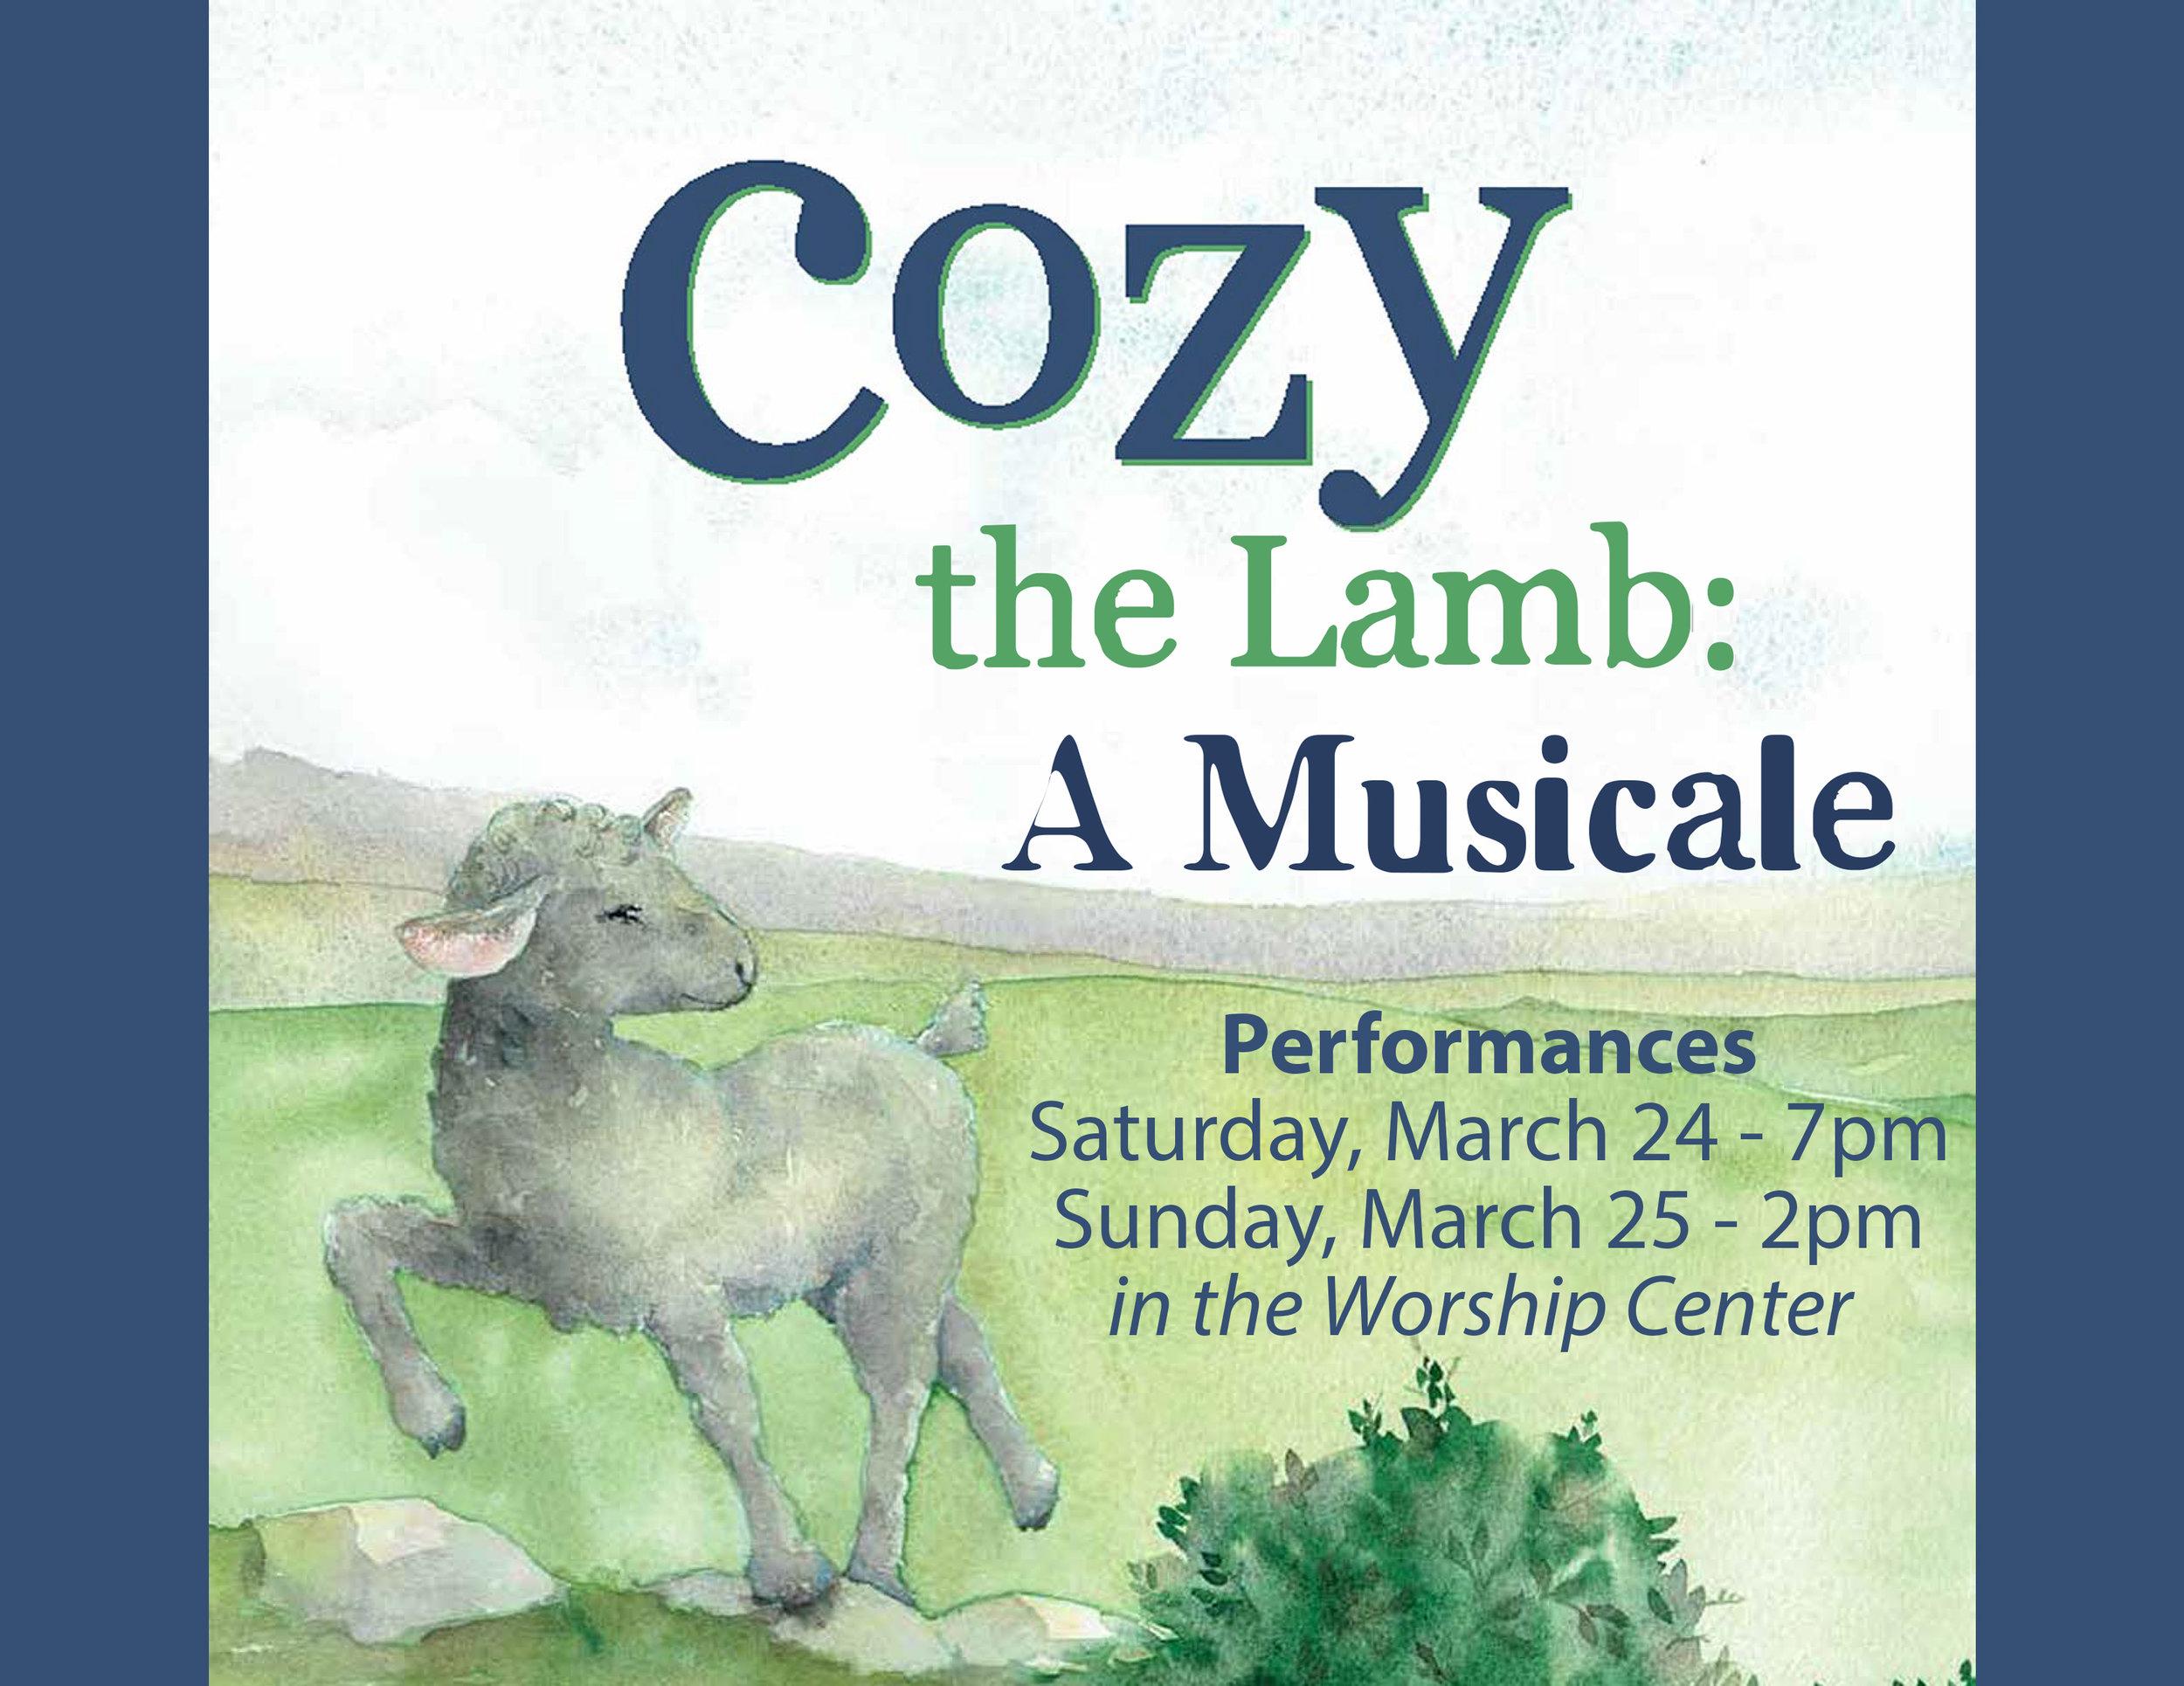 Cozy the Lamb.jpg